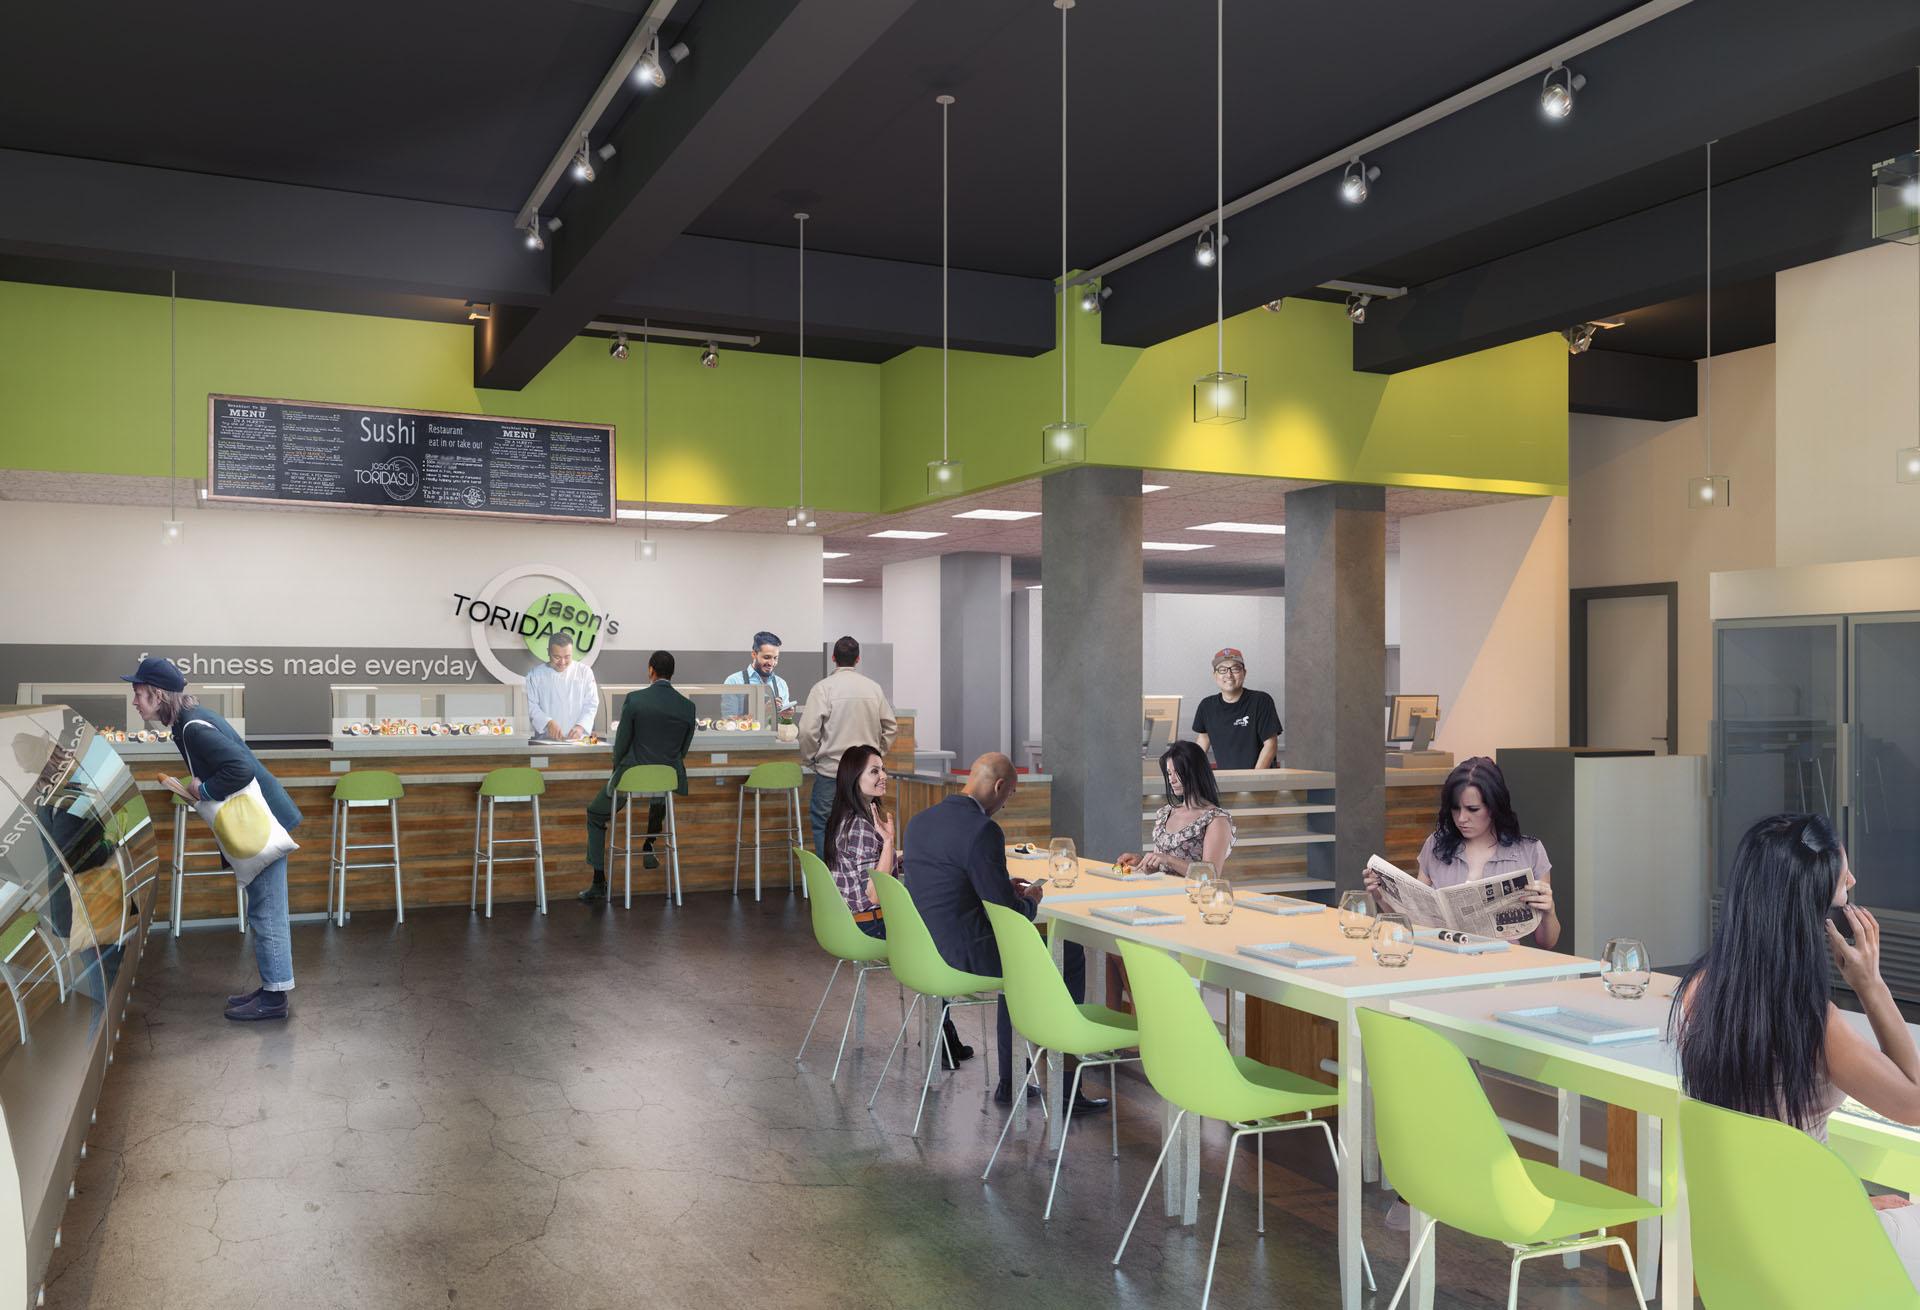 Interior restaurant rendering